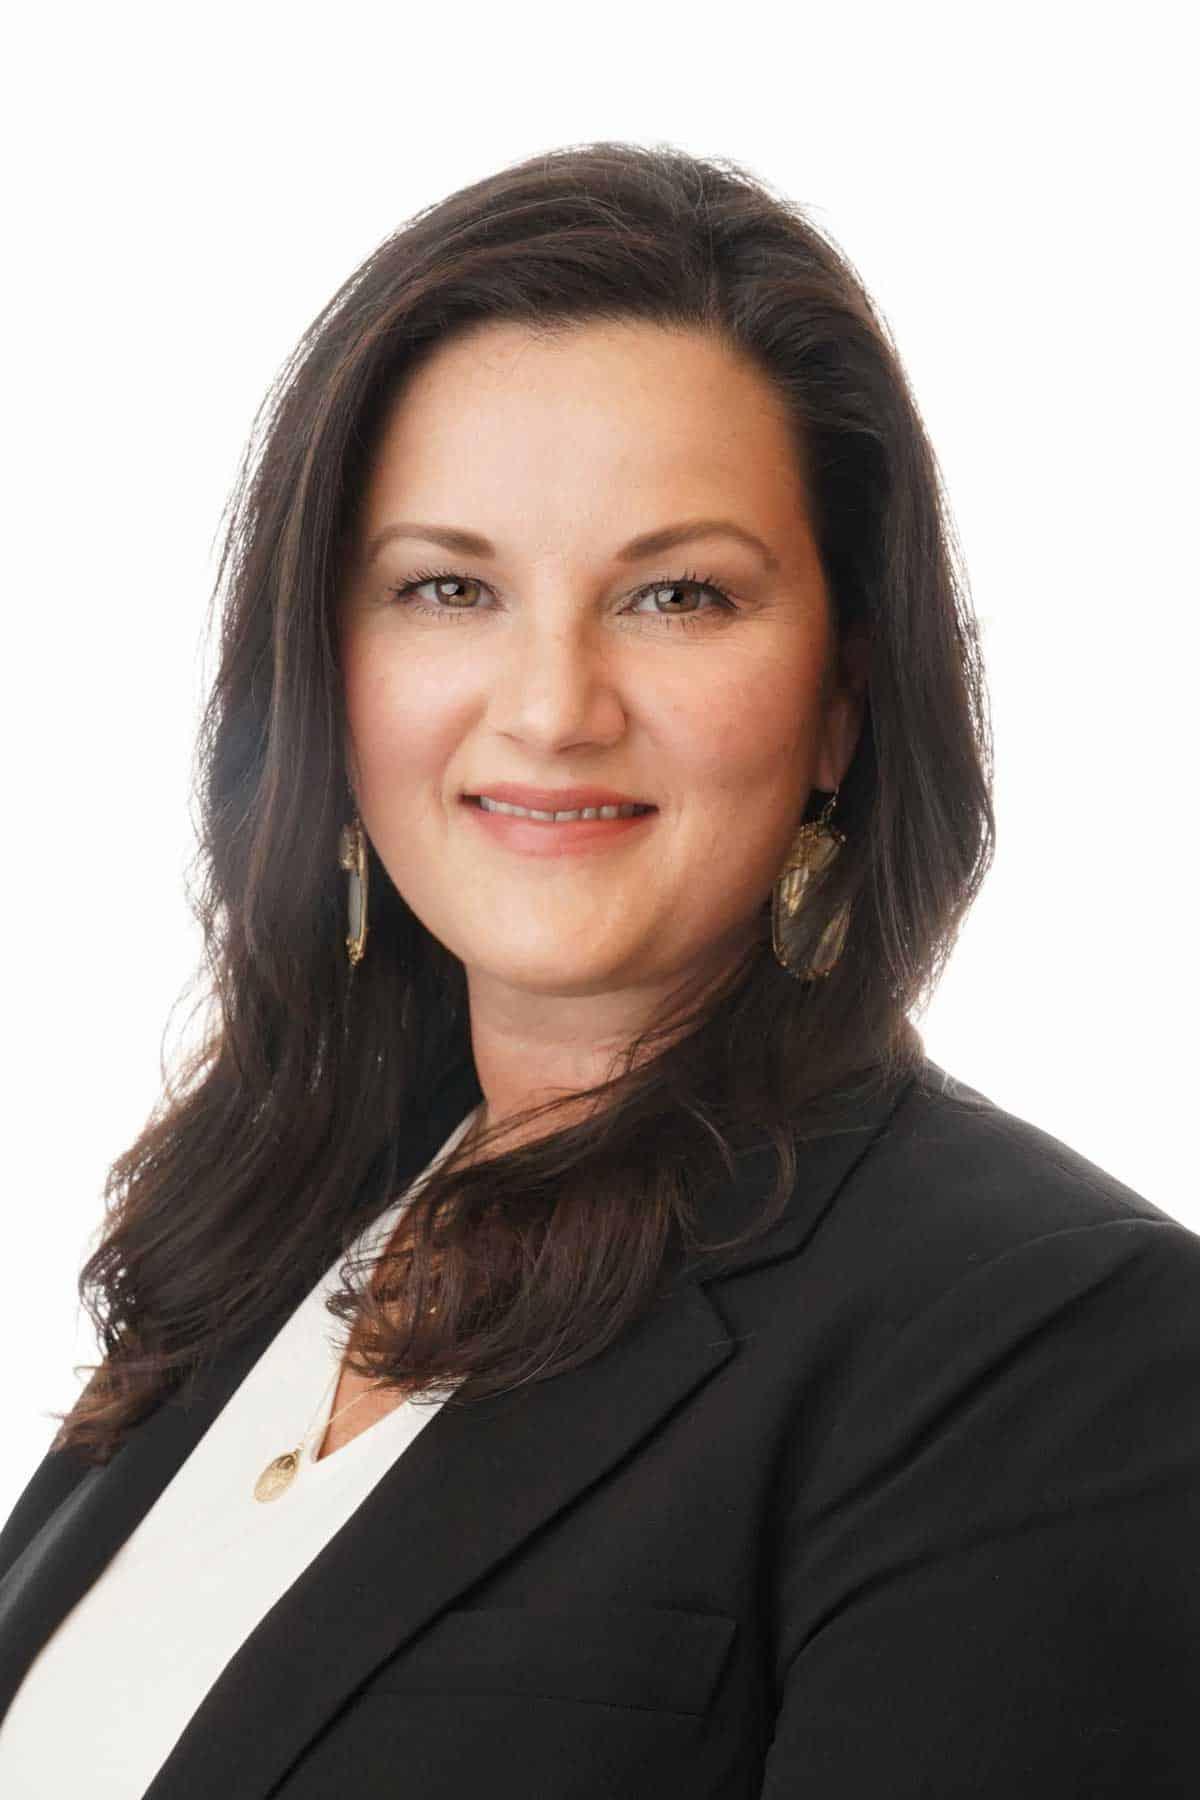 Jennifer-Pinkerton-LMSW-LCDC-Program-Director